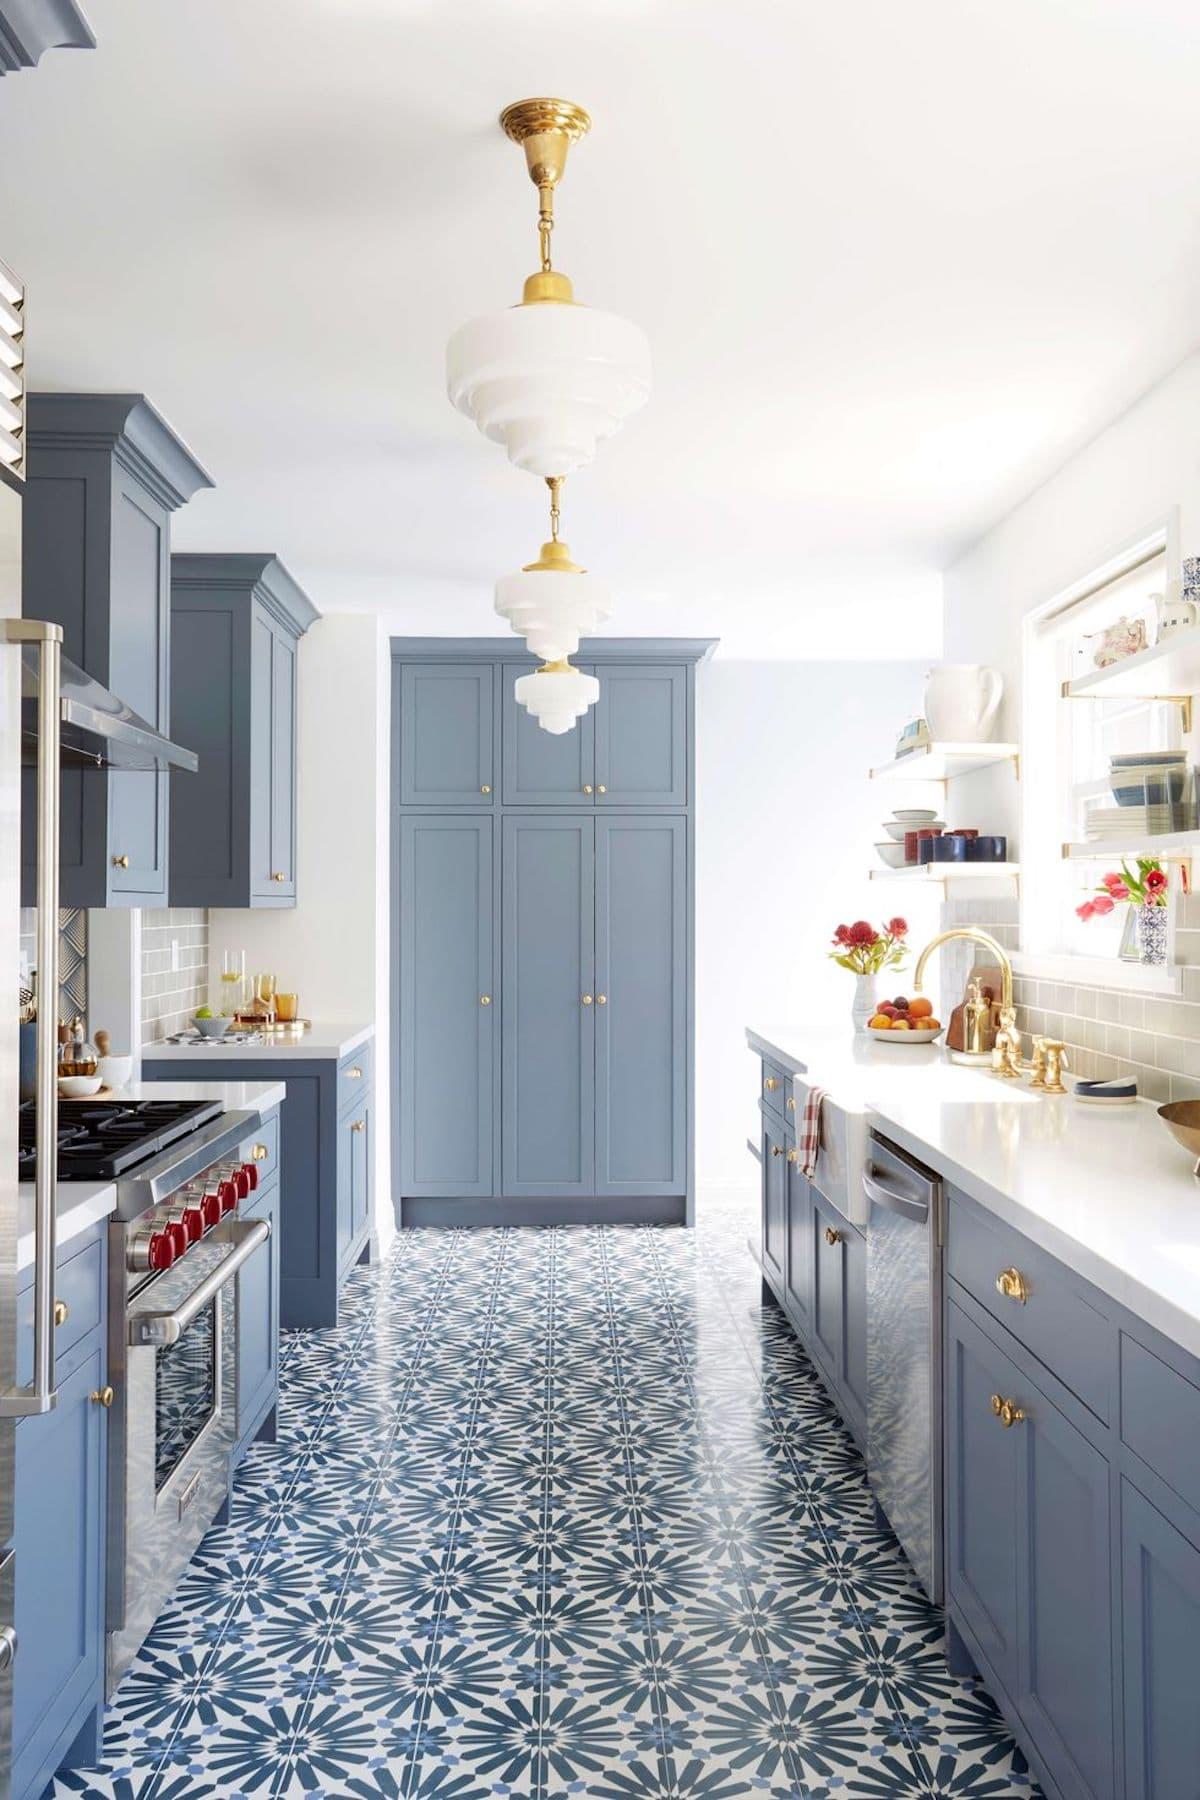 blue kitchen design ideas with patterned tile floor